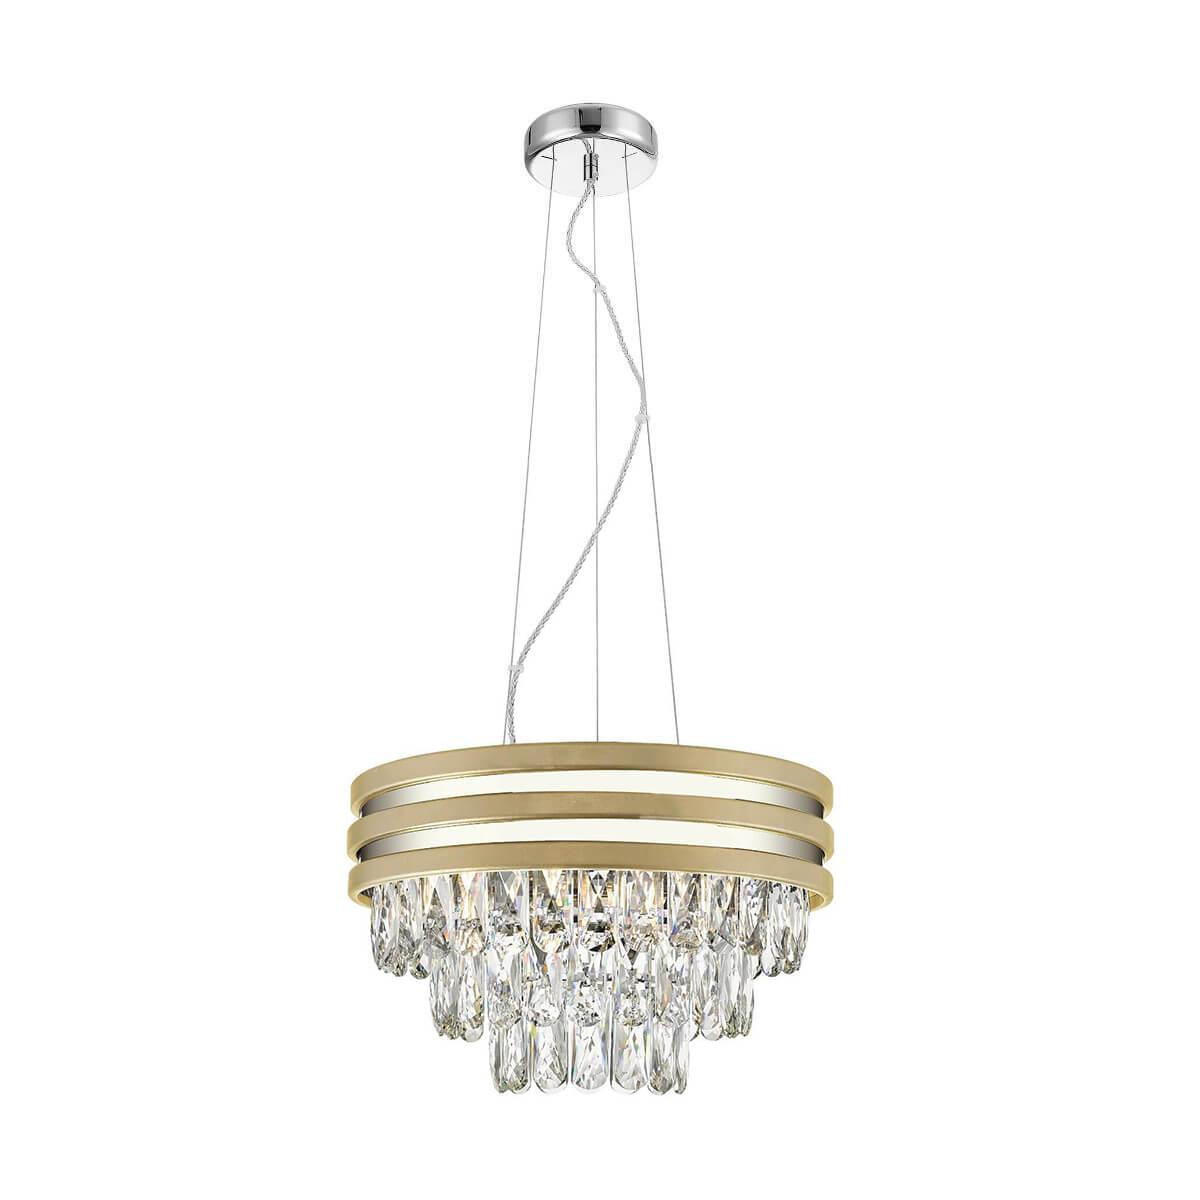 Висяща лампа Naica, сребристо и златно